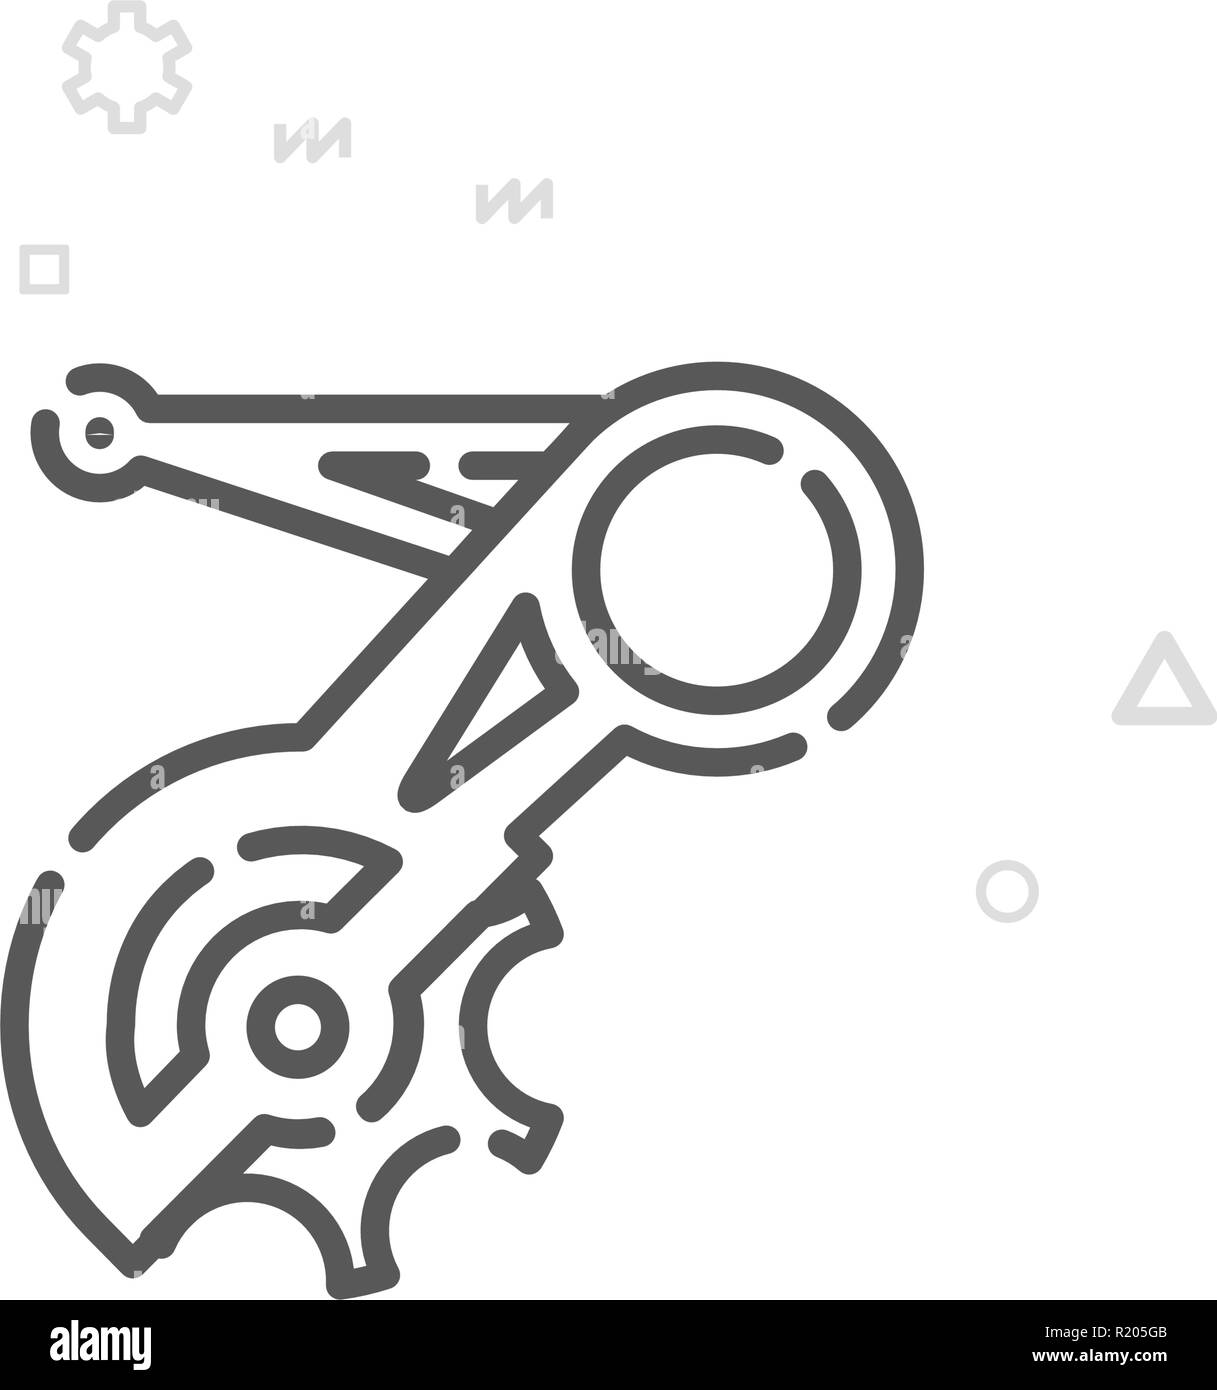 Bike Rear Derailleur Vector Line Icon, Symbol, Pictogram, Sign. Light Abstract Geometric Background. Editable Stroke - Stock Vector